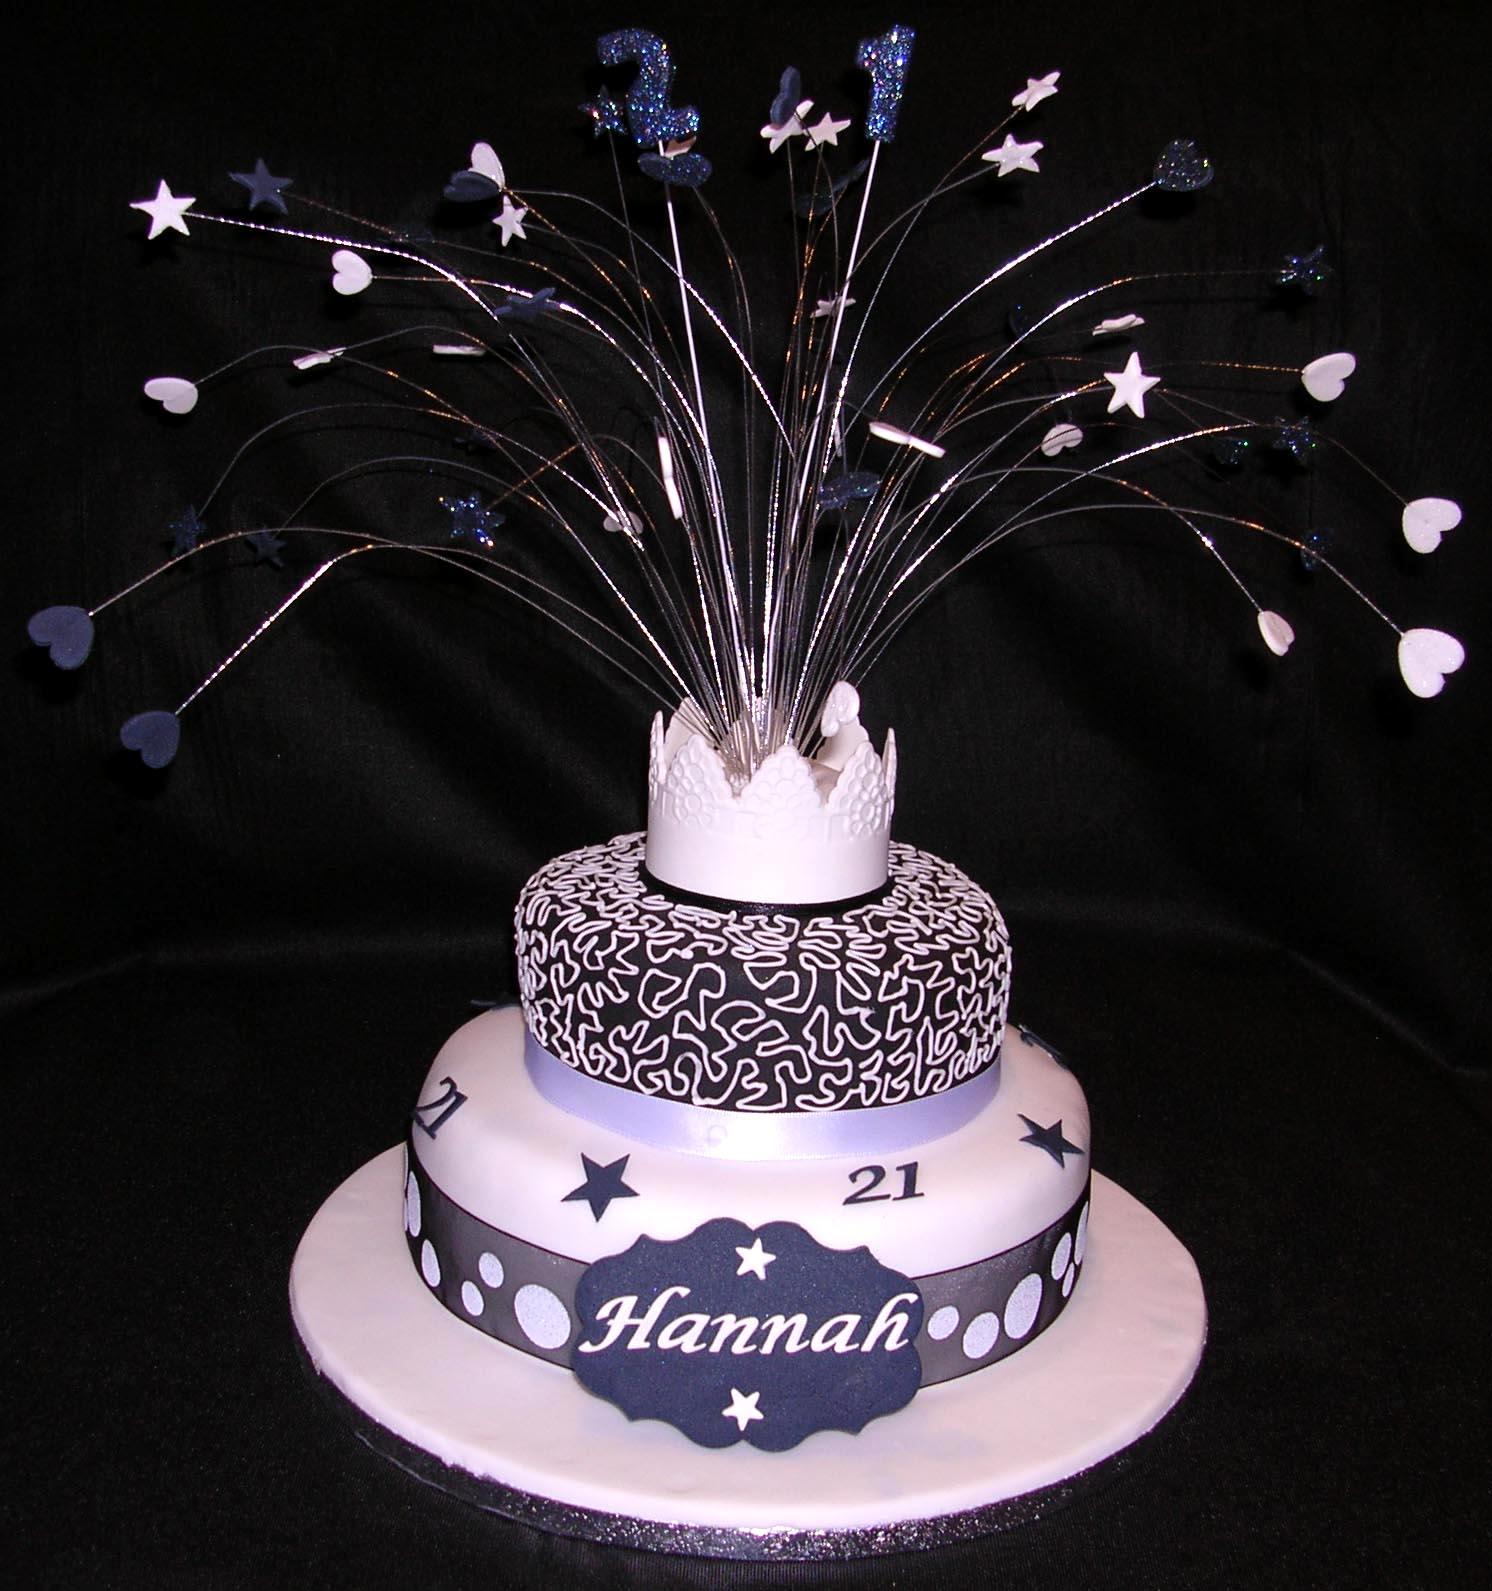 21st Birthday Cakes Decoration Ideas